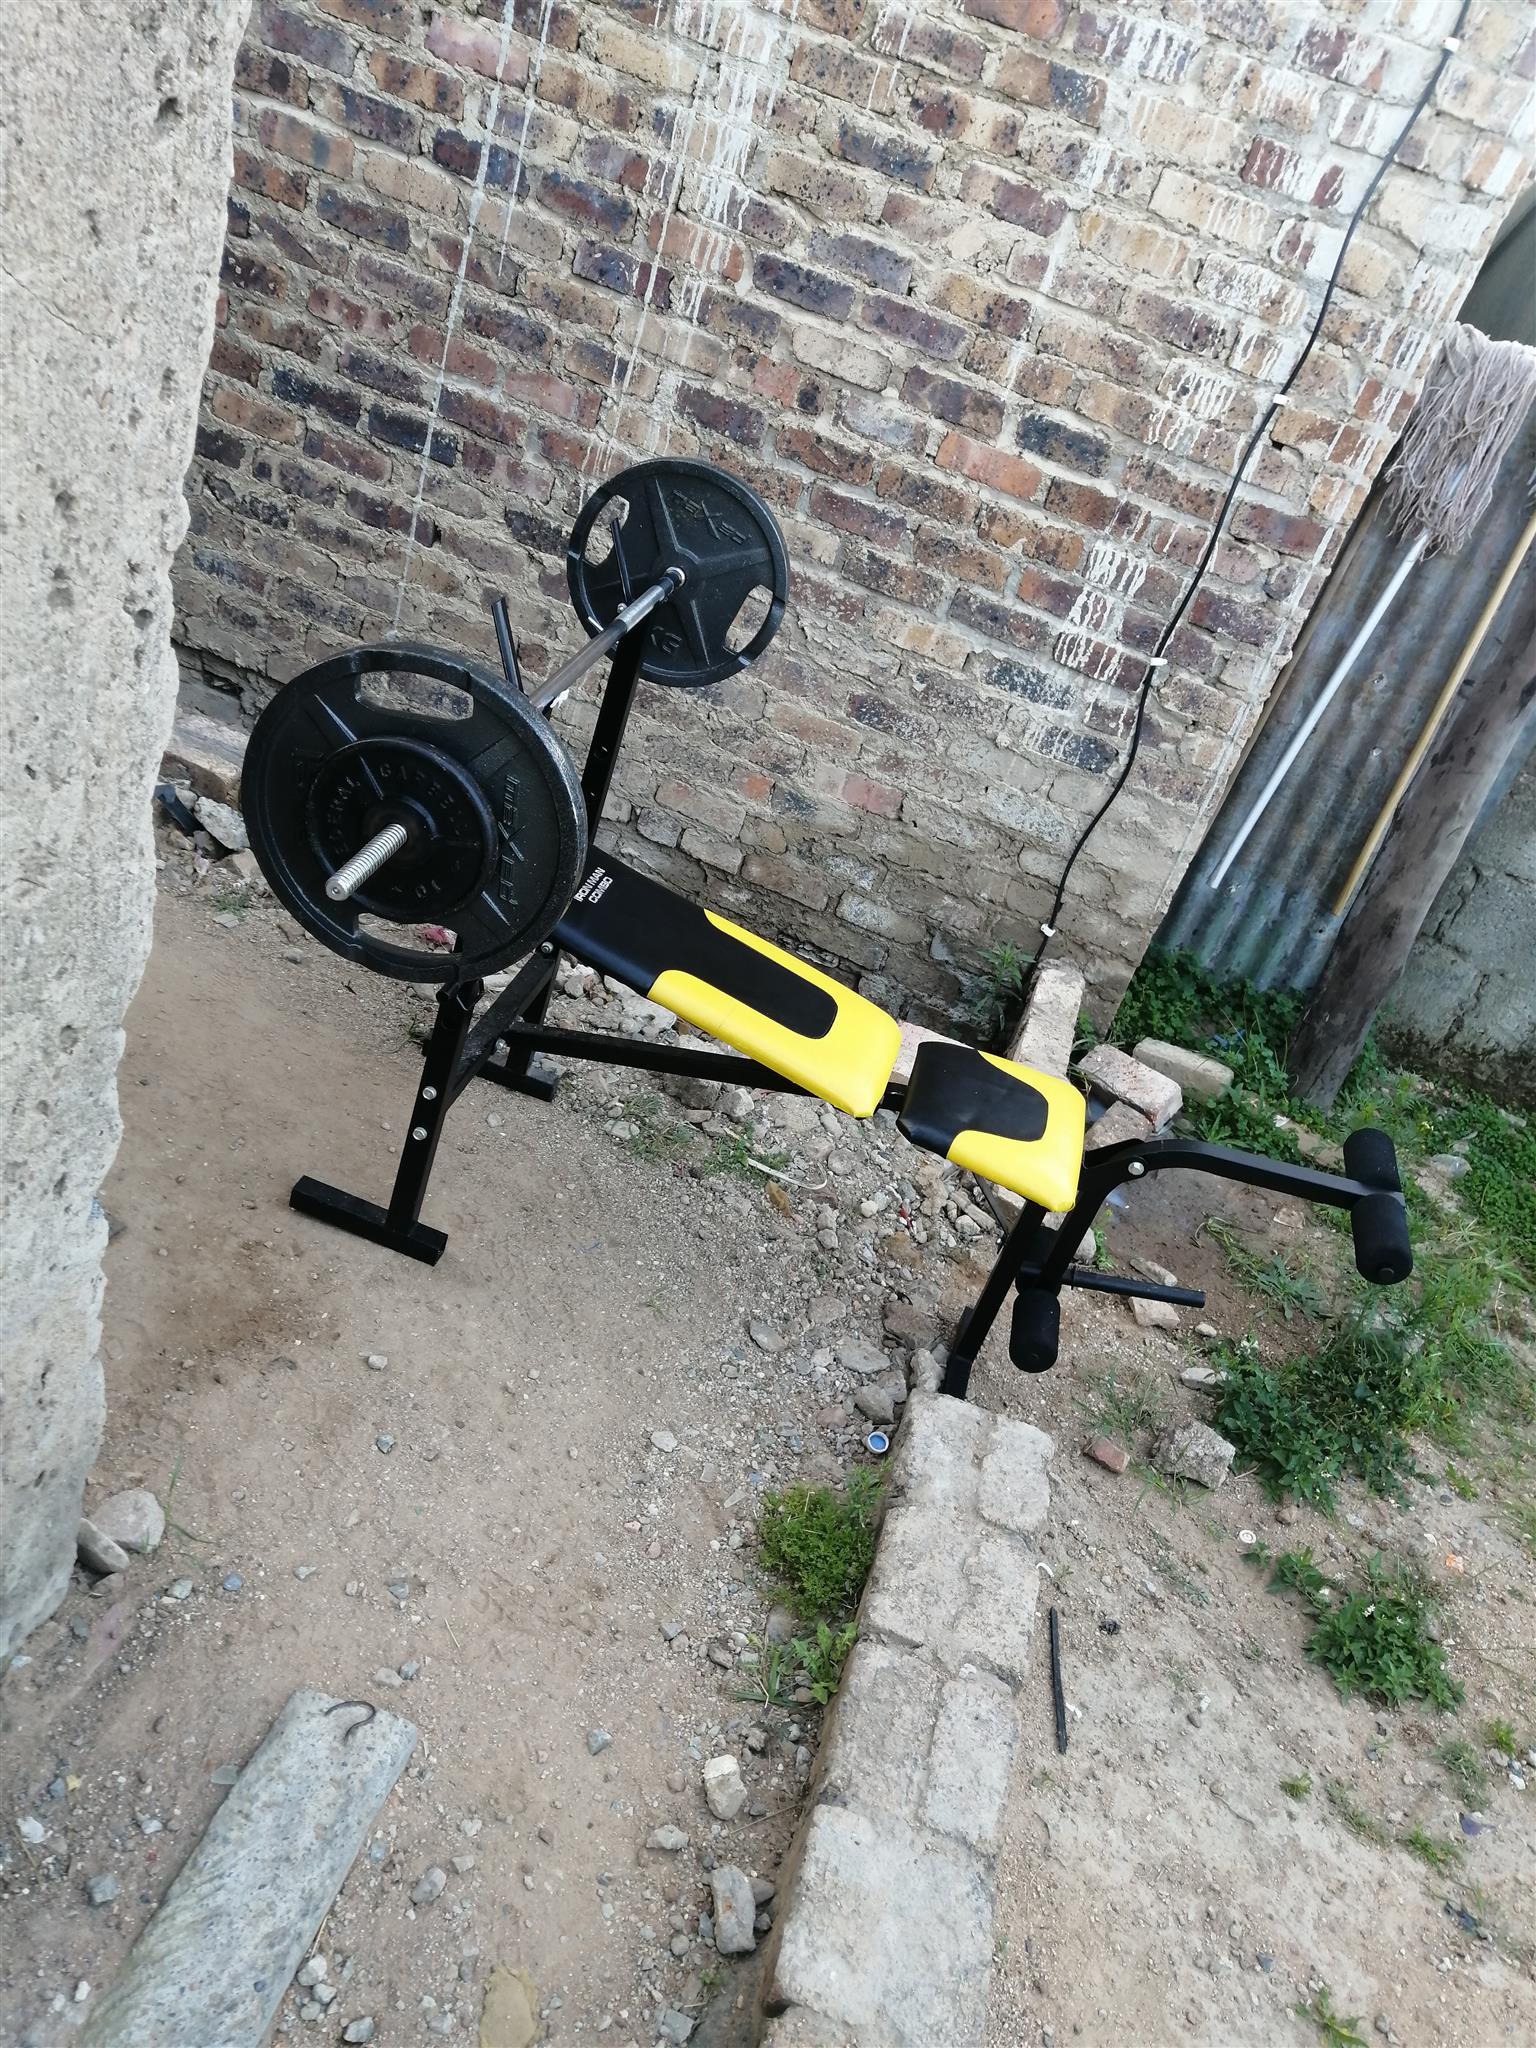 Bench press for gym